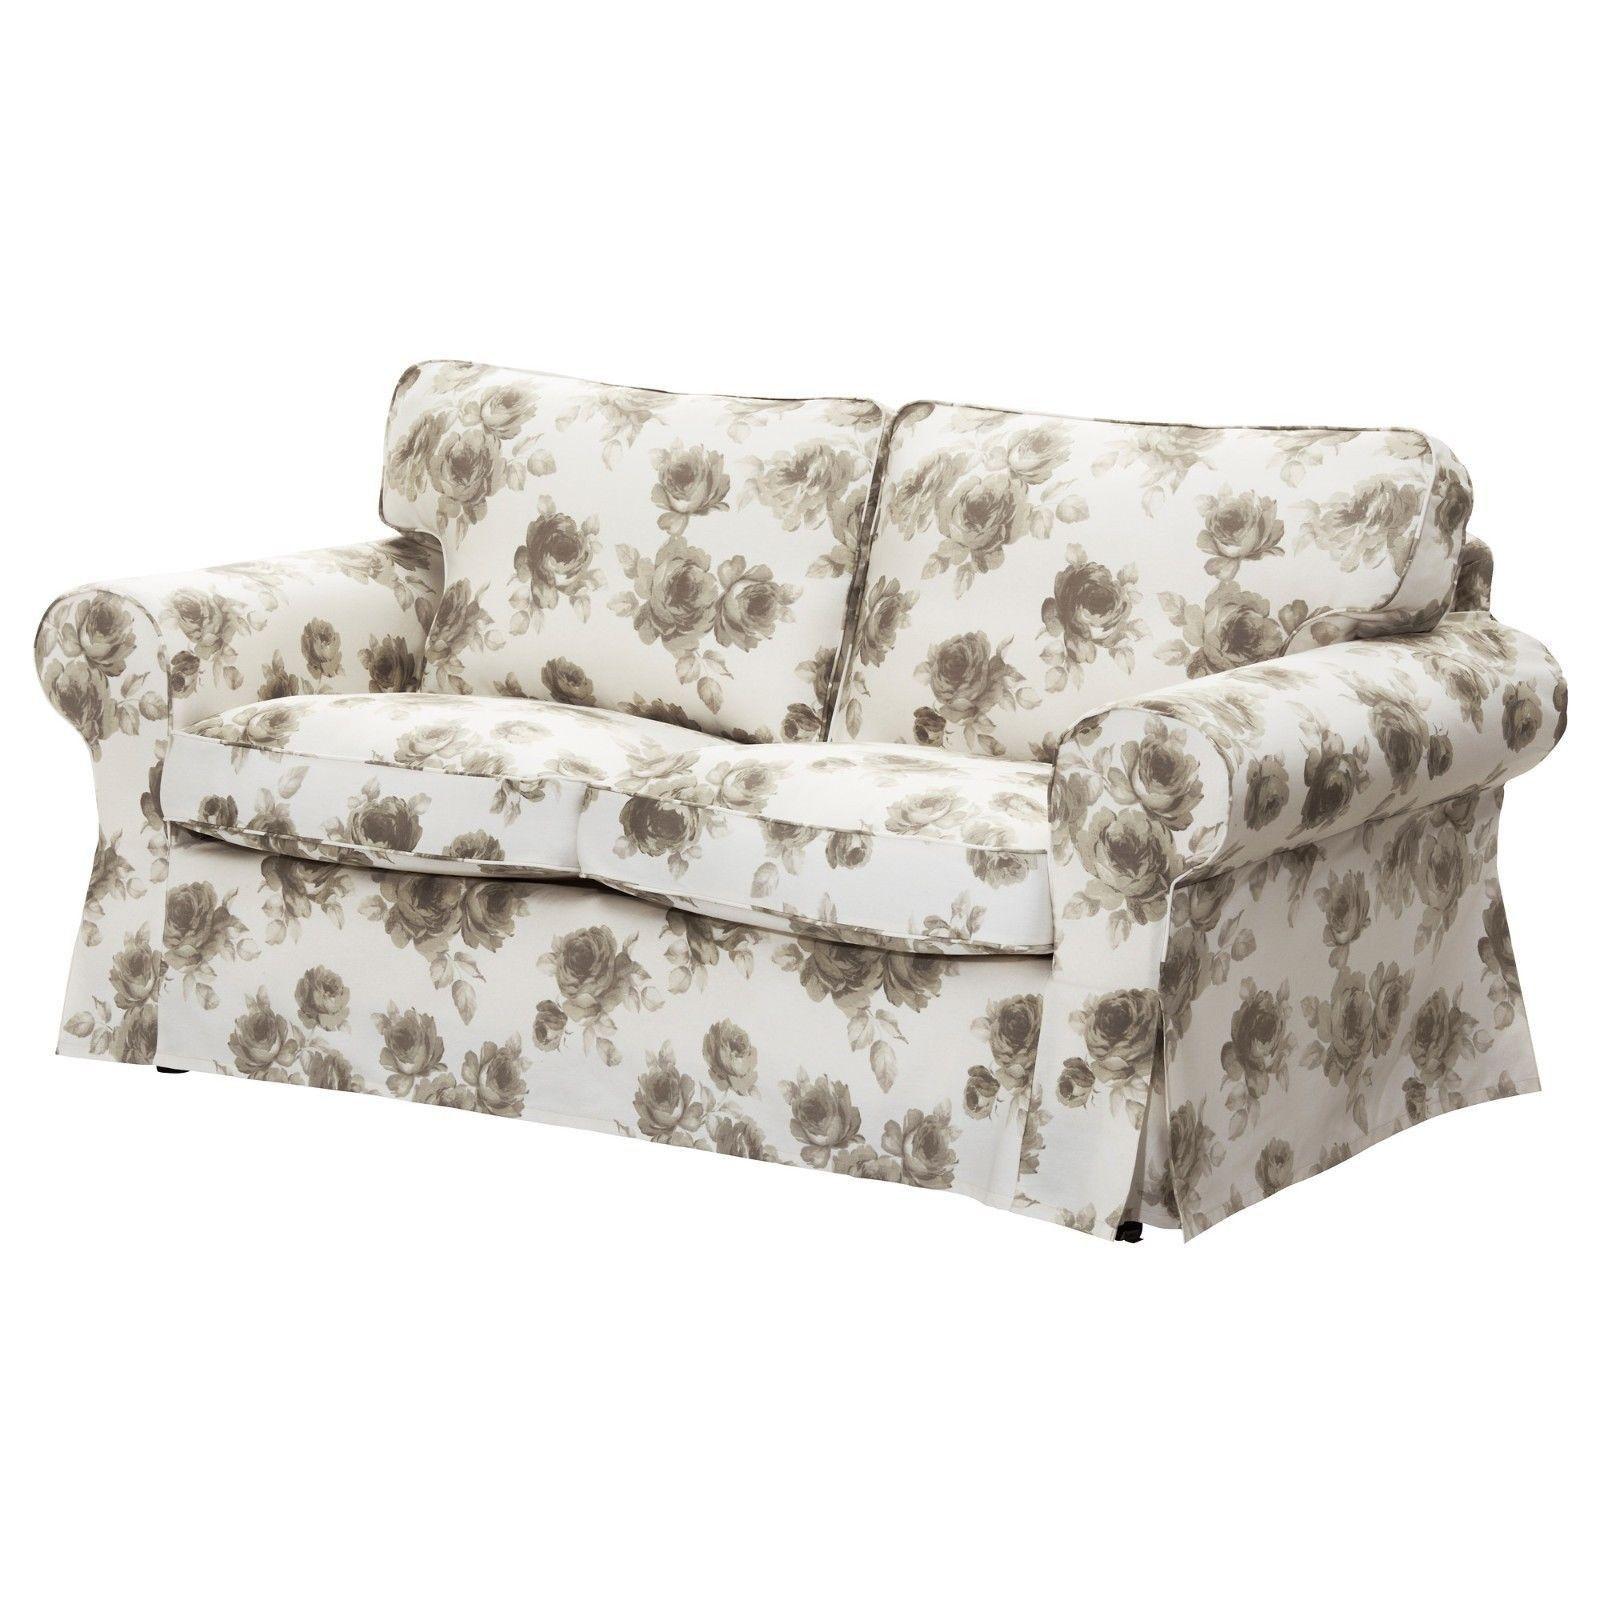 ikea usa chair covers tv ektorp sofa cover 2 seat loveseat slipcover norlida